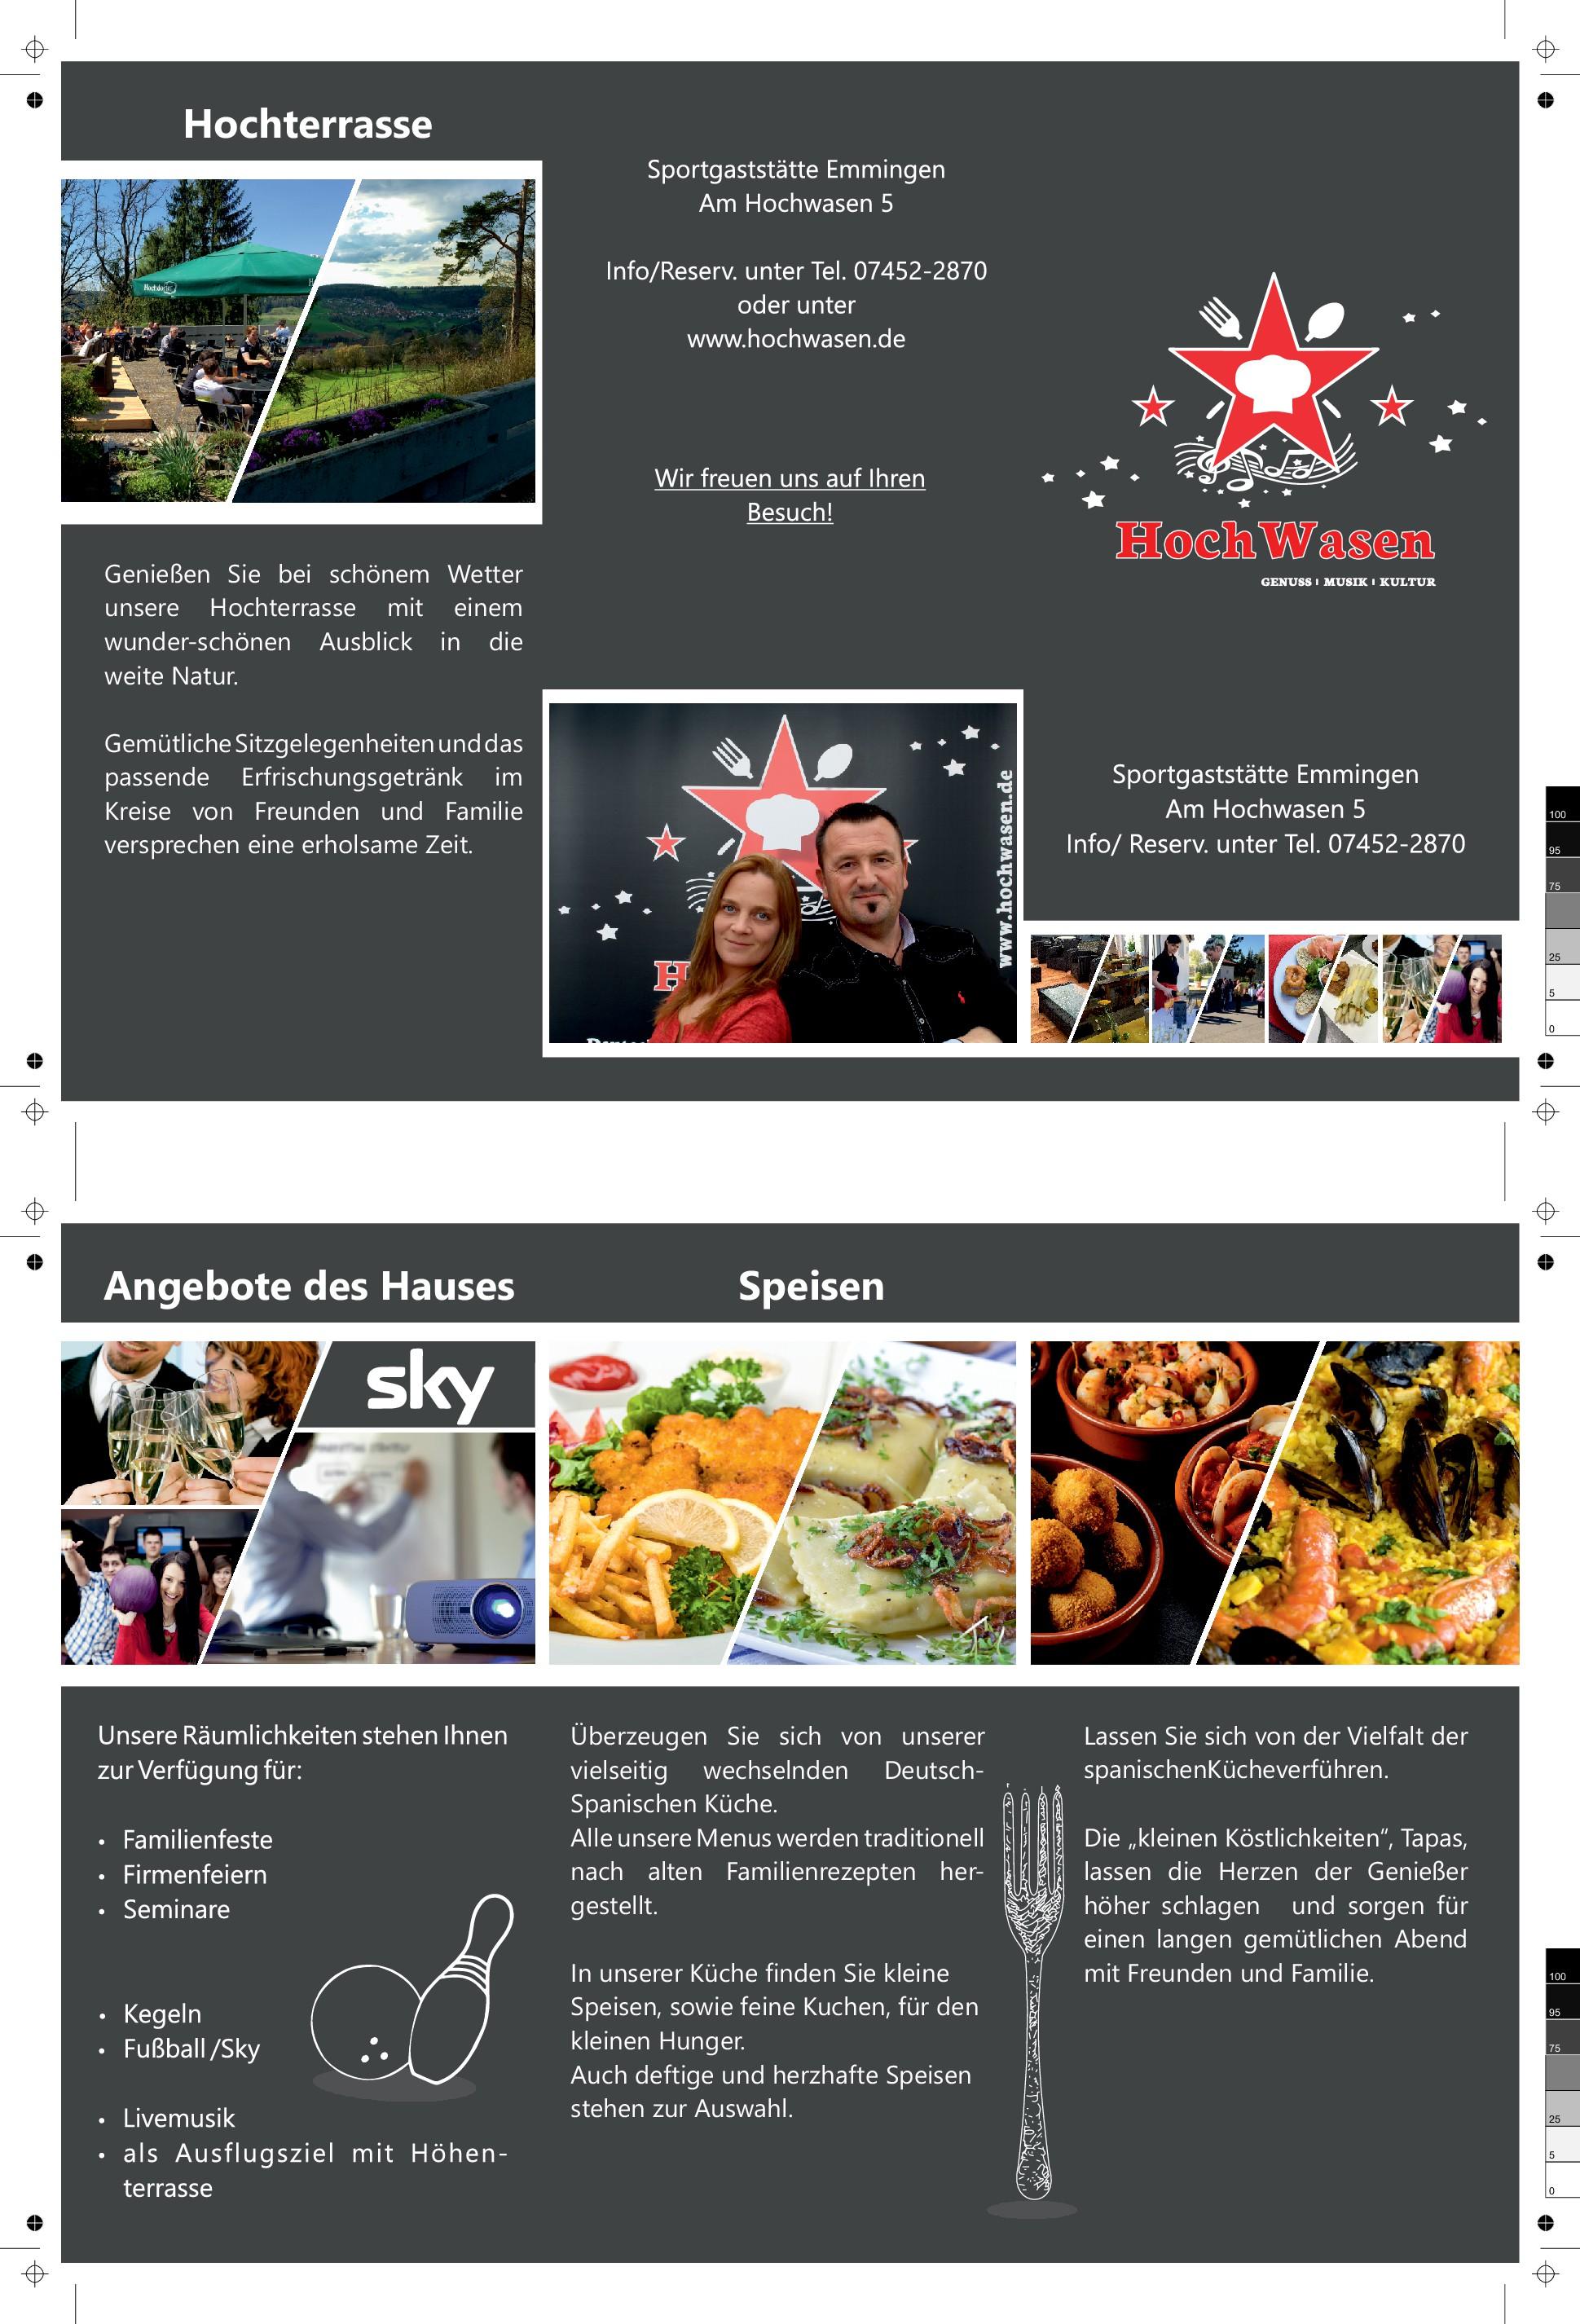 Image-Faltflyer für Eventgastronomie- Image-folding flyer for event catering trade